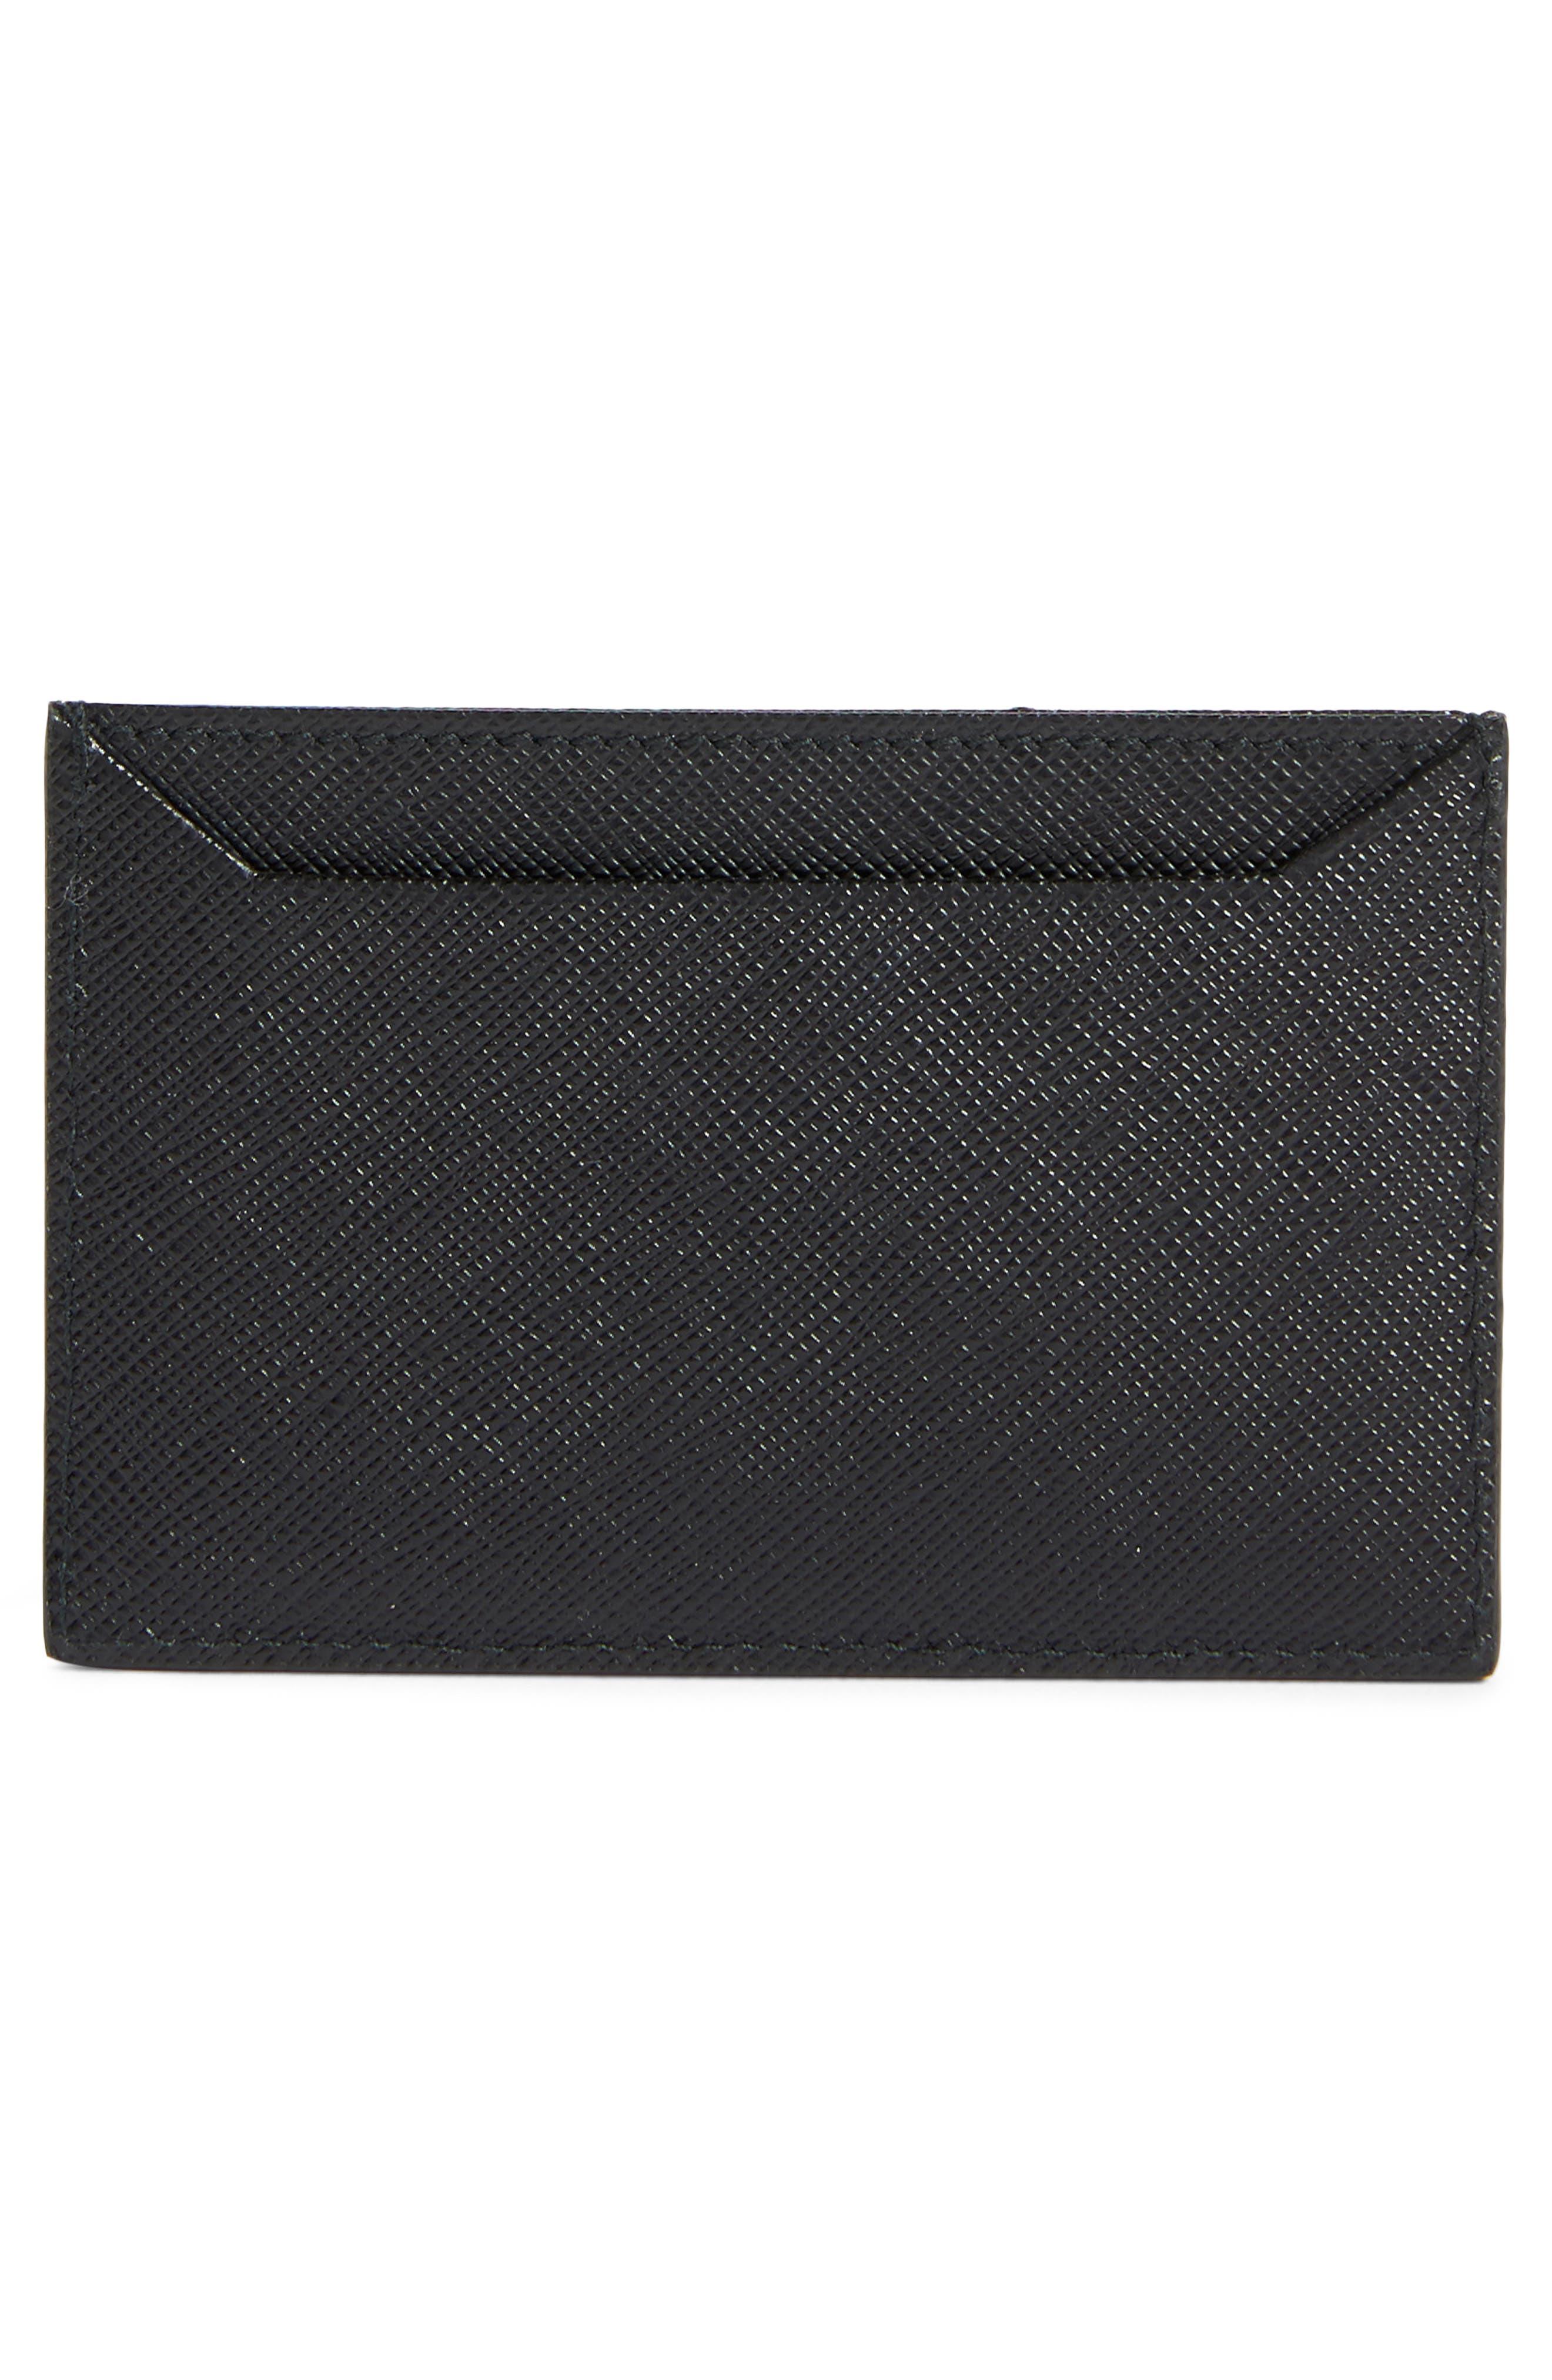 PRADA,                             Saffiano Leather Card Case,                             Alternate thumbnail 2, color,                             F0N98 NERO/ROSSO